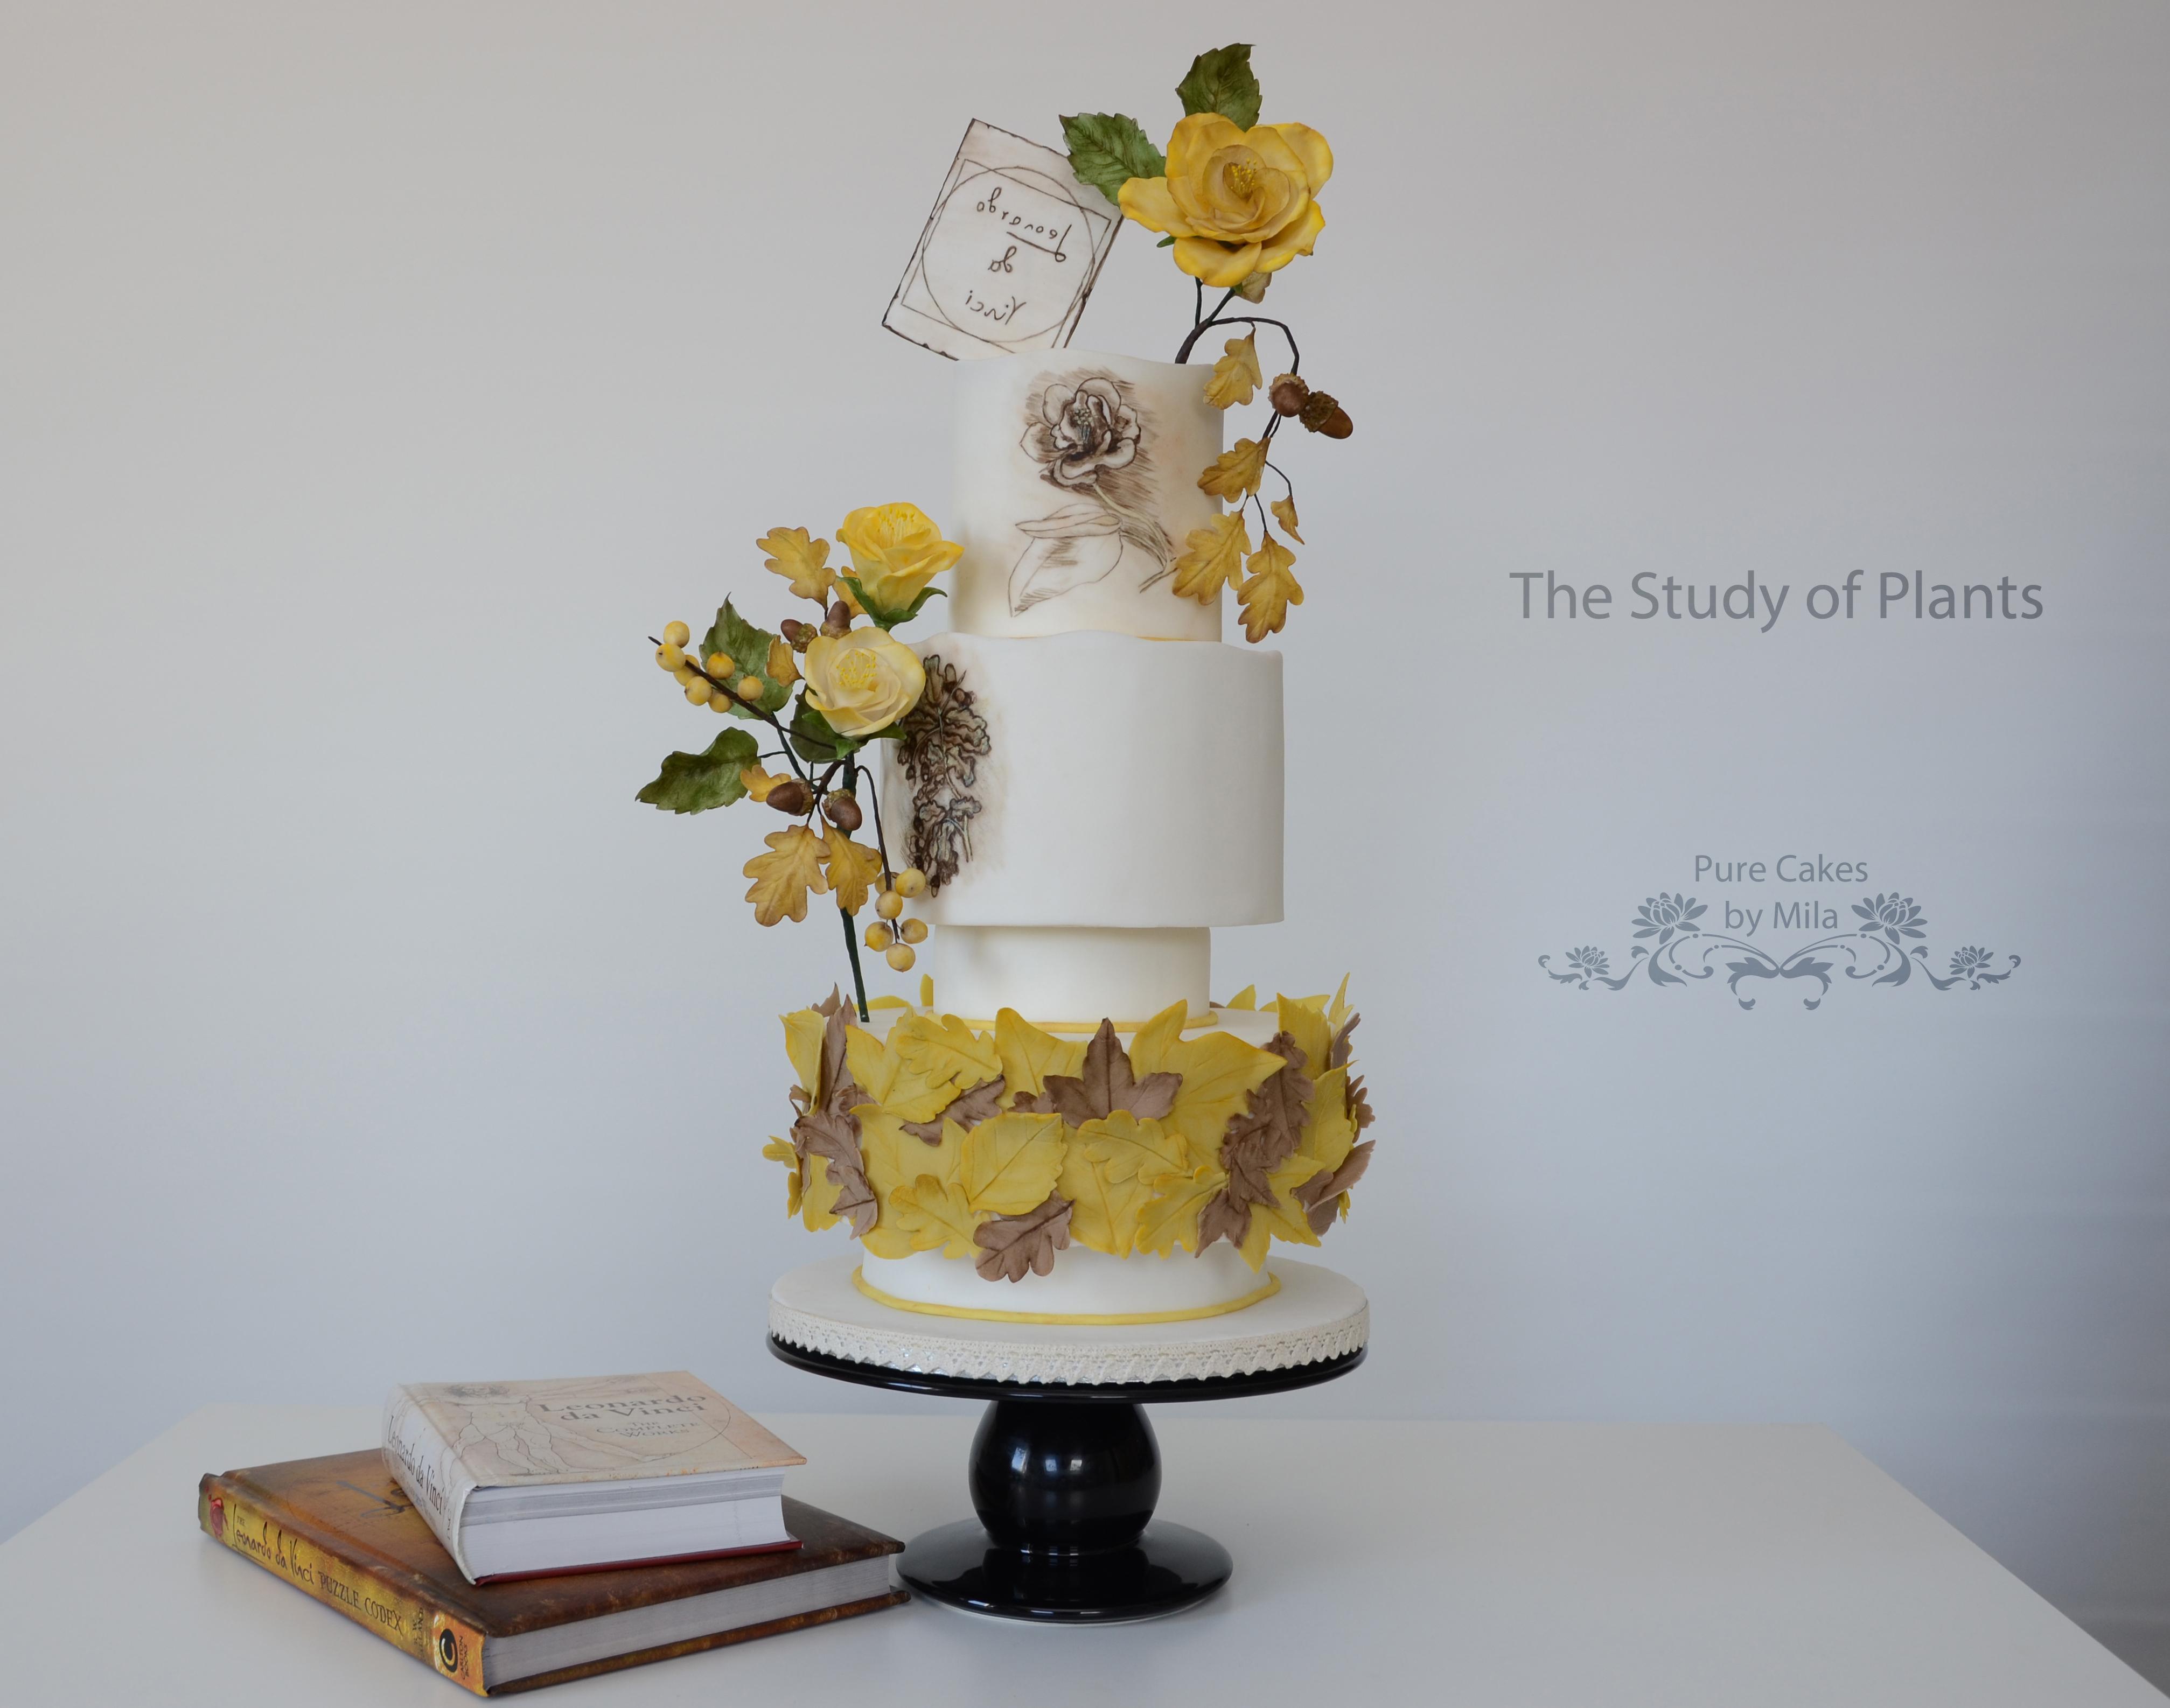 3.-Jamila-Jankipersadsing_Pure-Cakes-of-Mila_Study-of-Plants.jpg#asset:18148